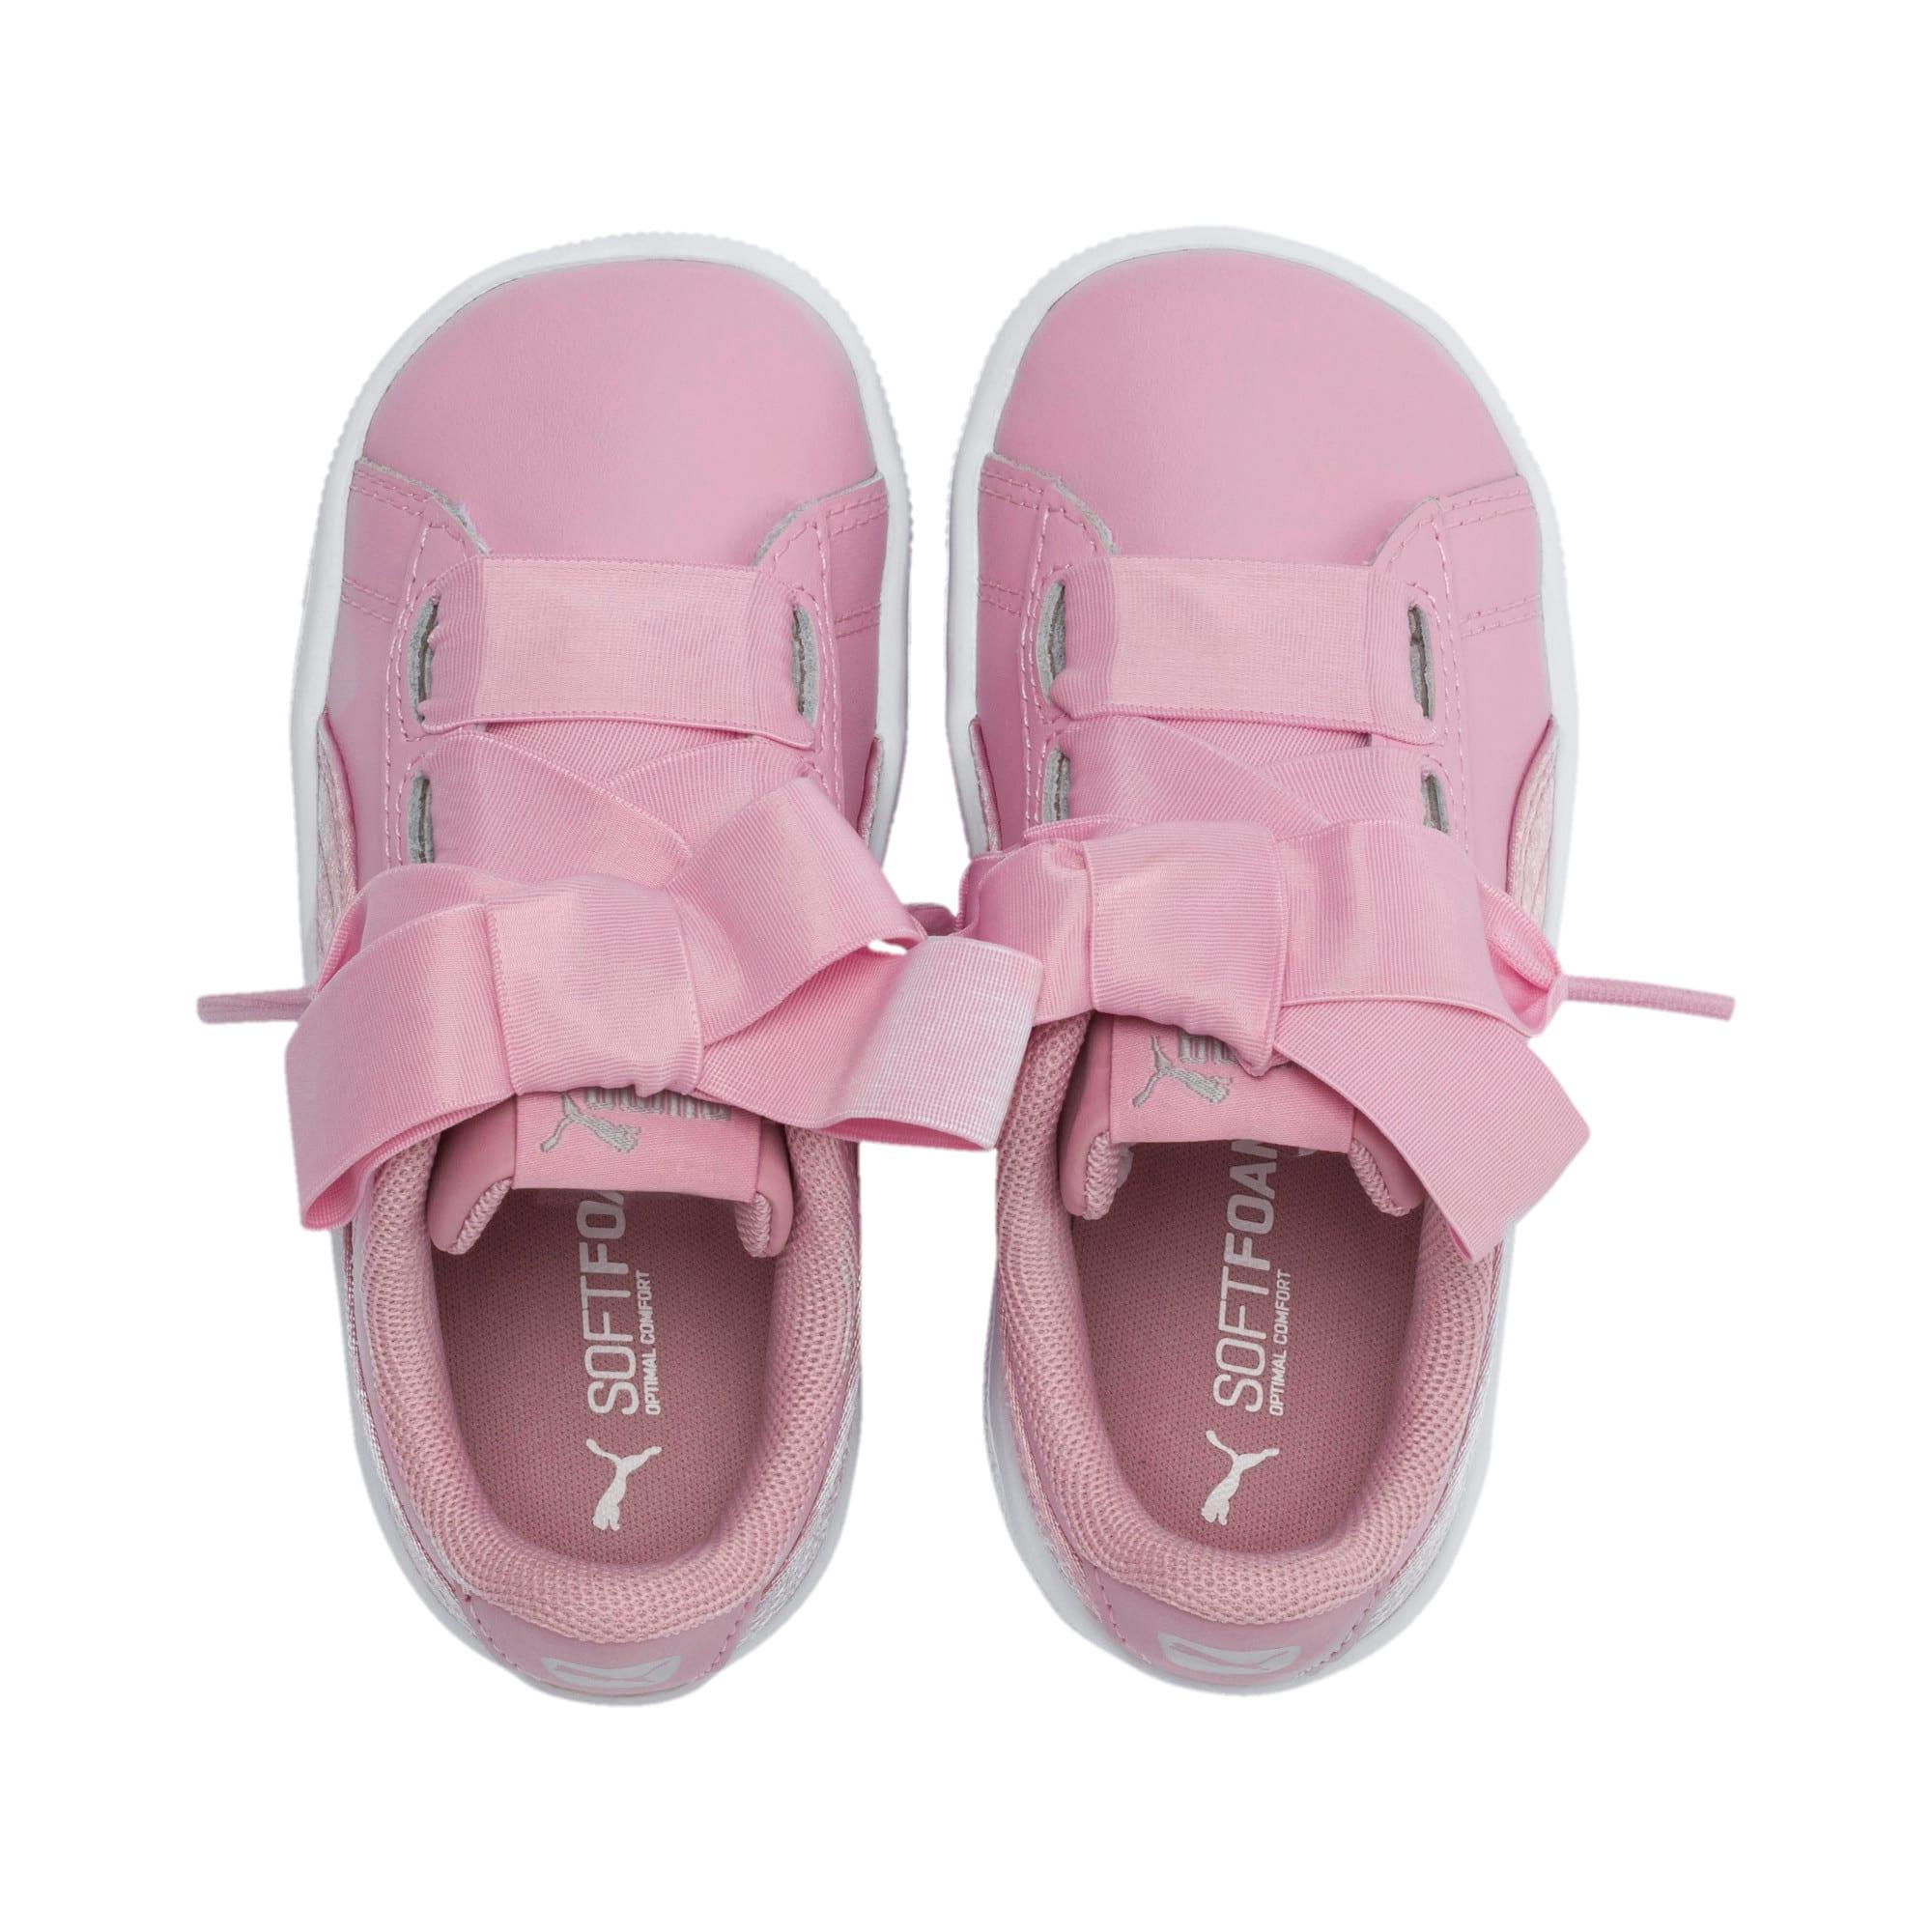 Miniatura 6 de ZapatosPUMA Vikky Ribbon Satin AC para niños, Pale Pink-Pale Pink, mediano